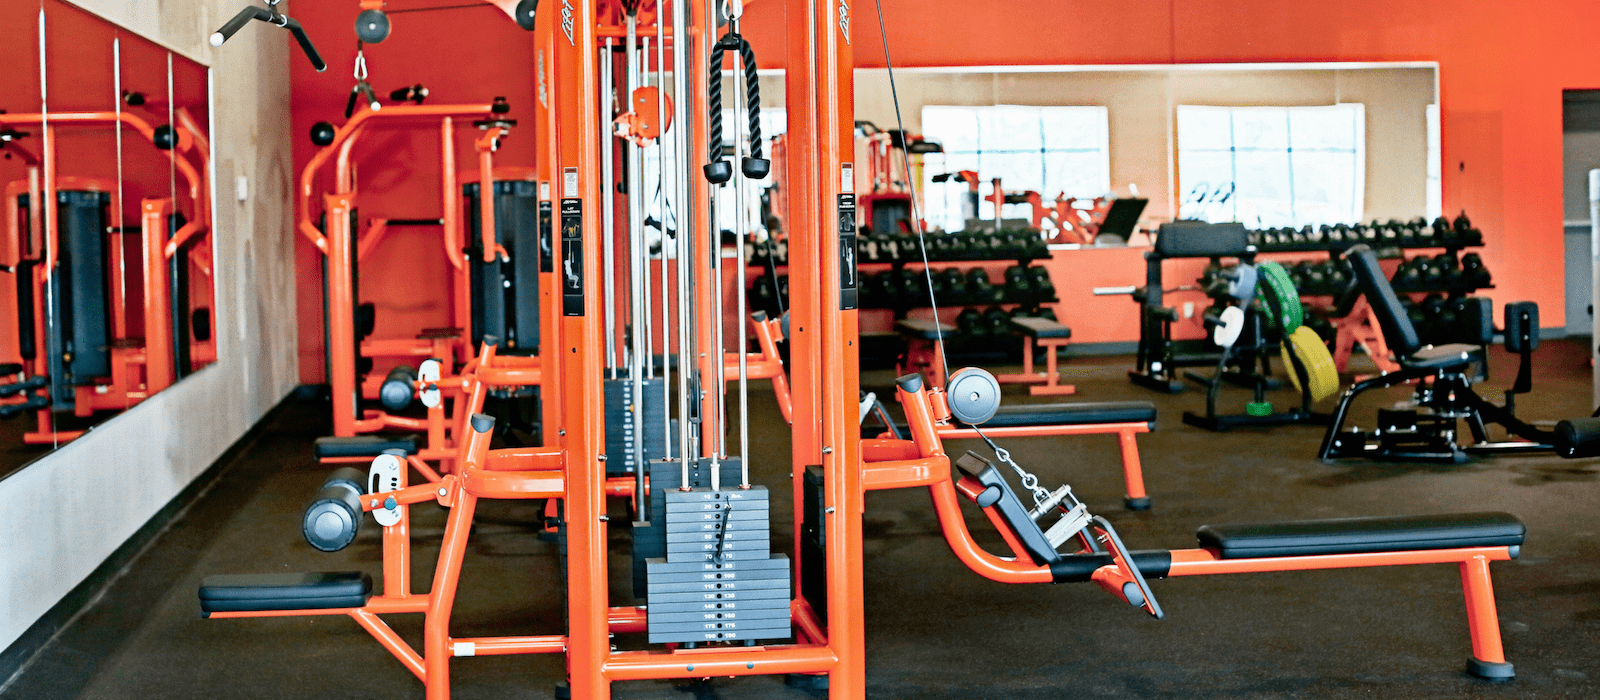 Fitaholic Fitness Ham Lake image 1